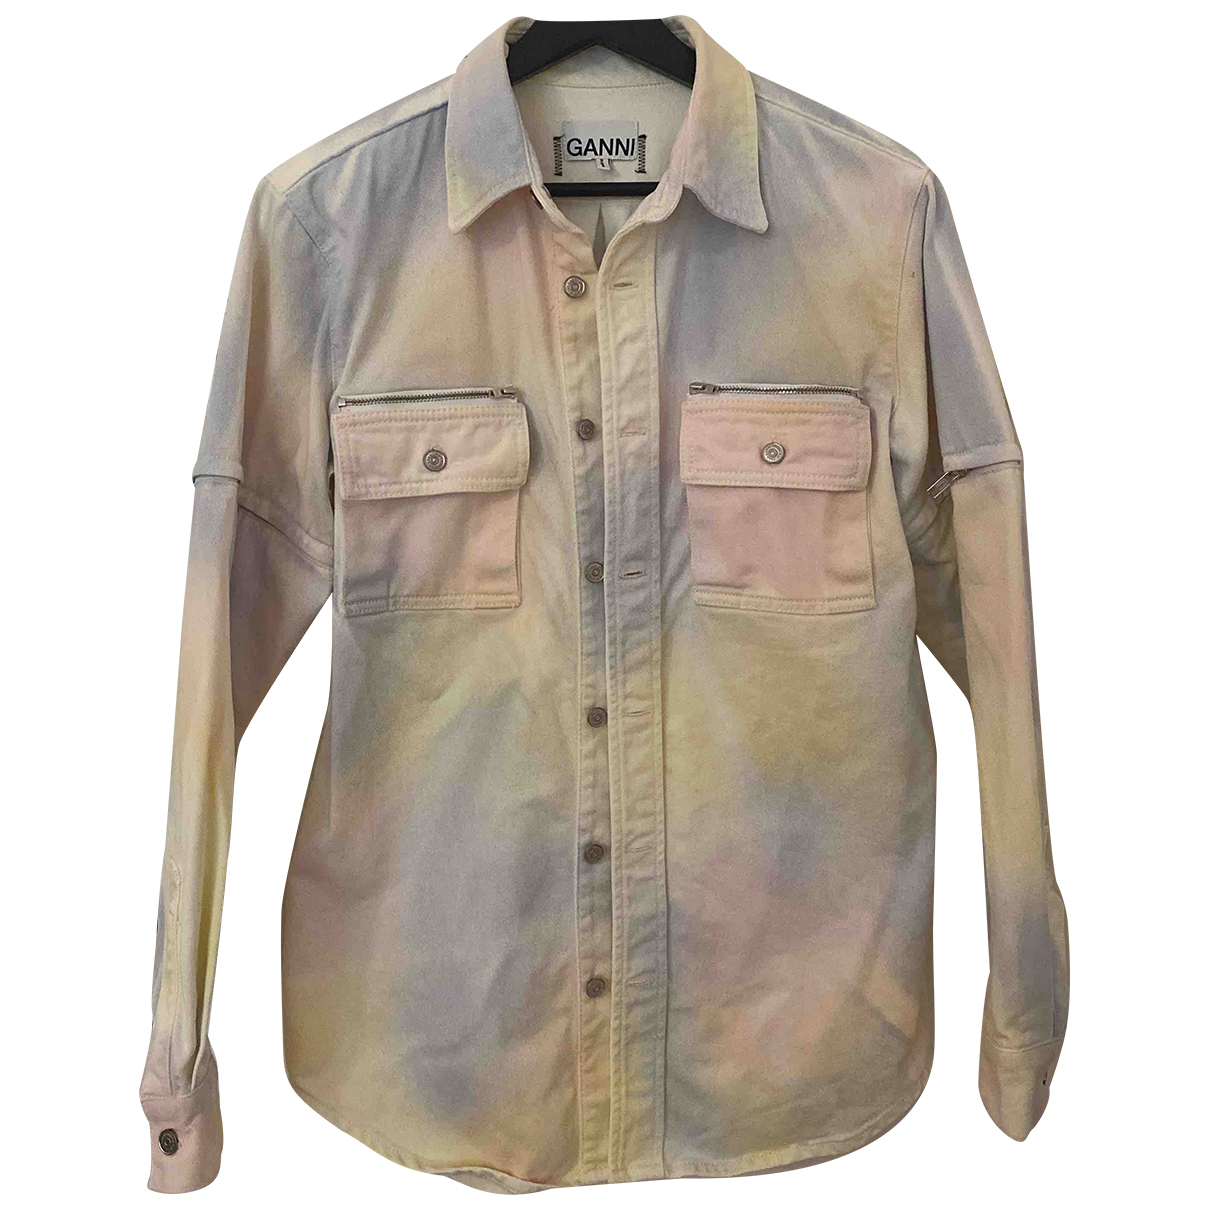 Ganni Spring Summer 2020 Jacke in  Bunt Denim - Jeans